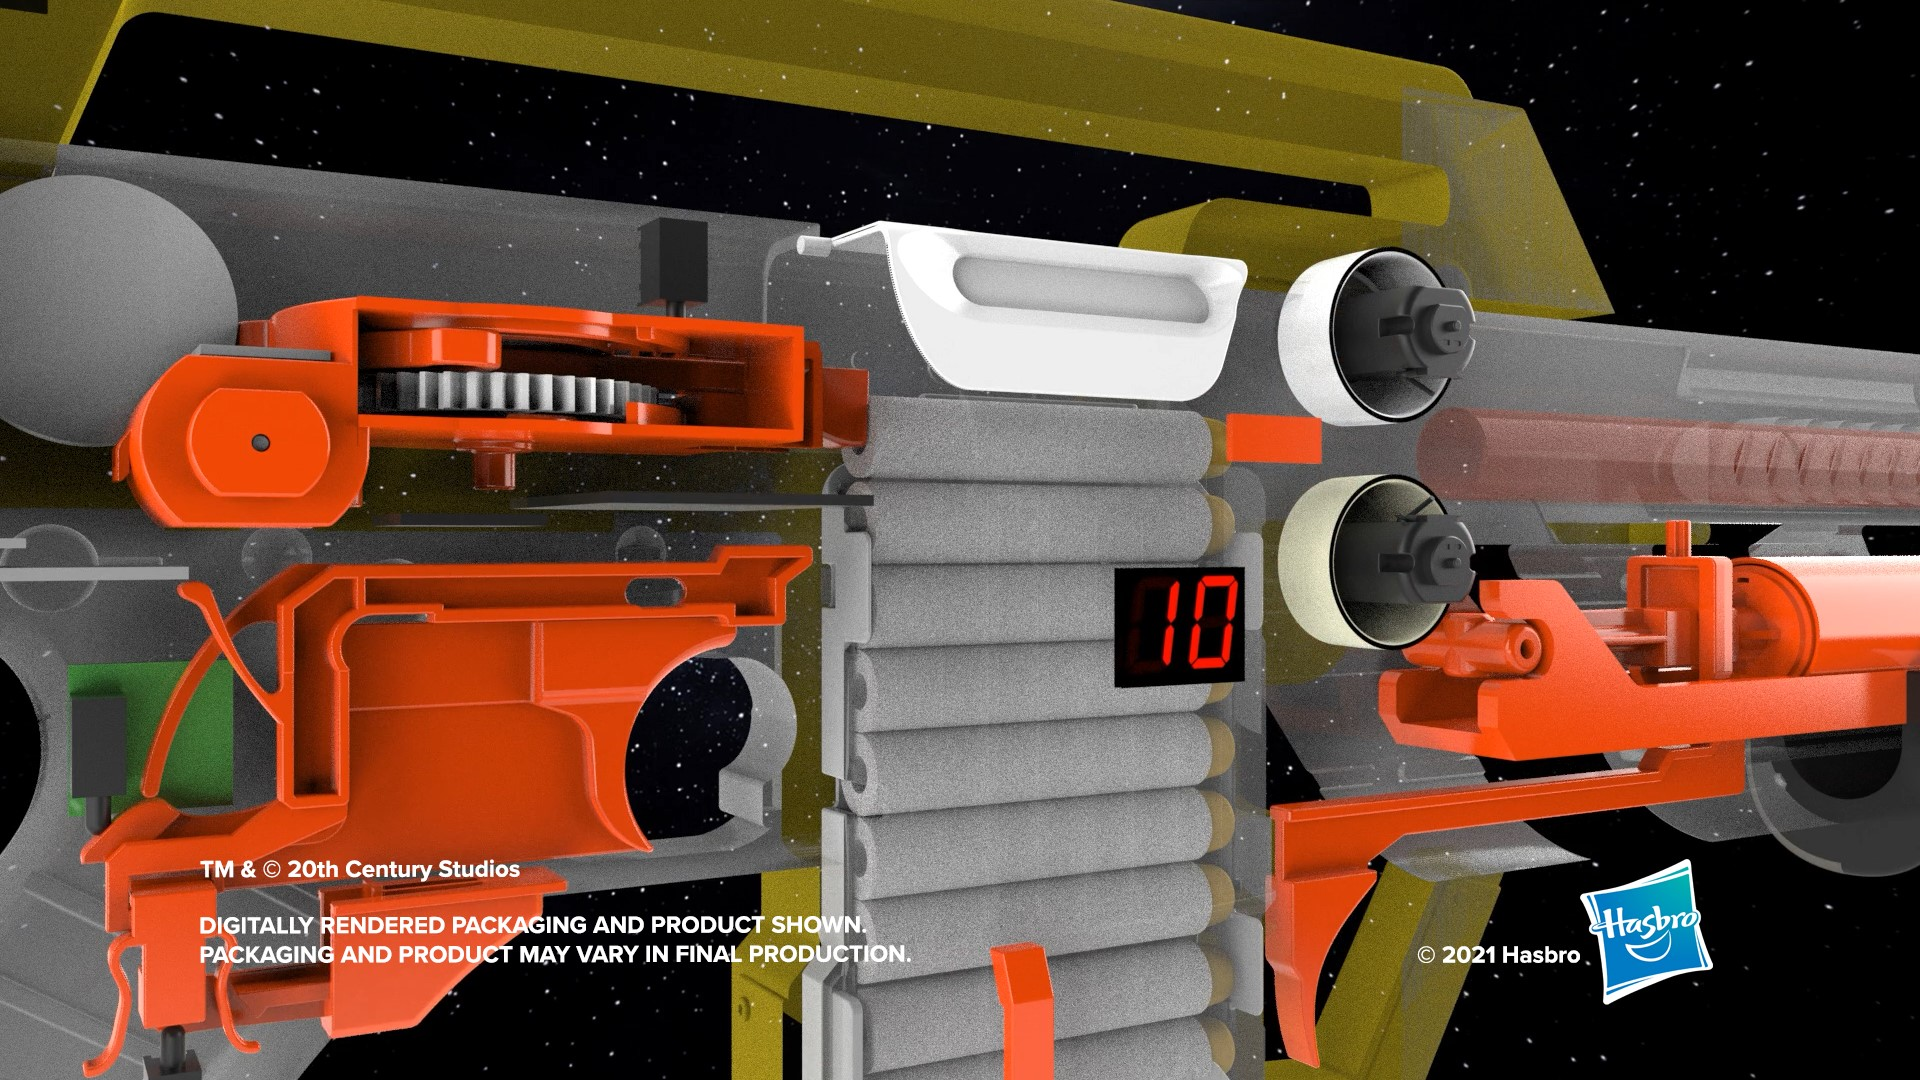 Hasbro creates a Nerf blaster based on the sci-fi film Aliens 19